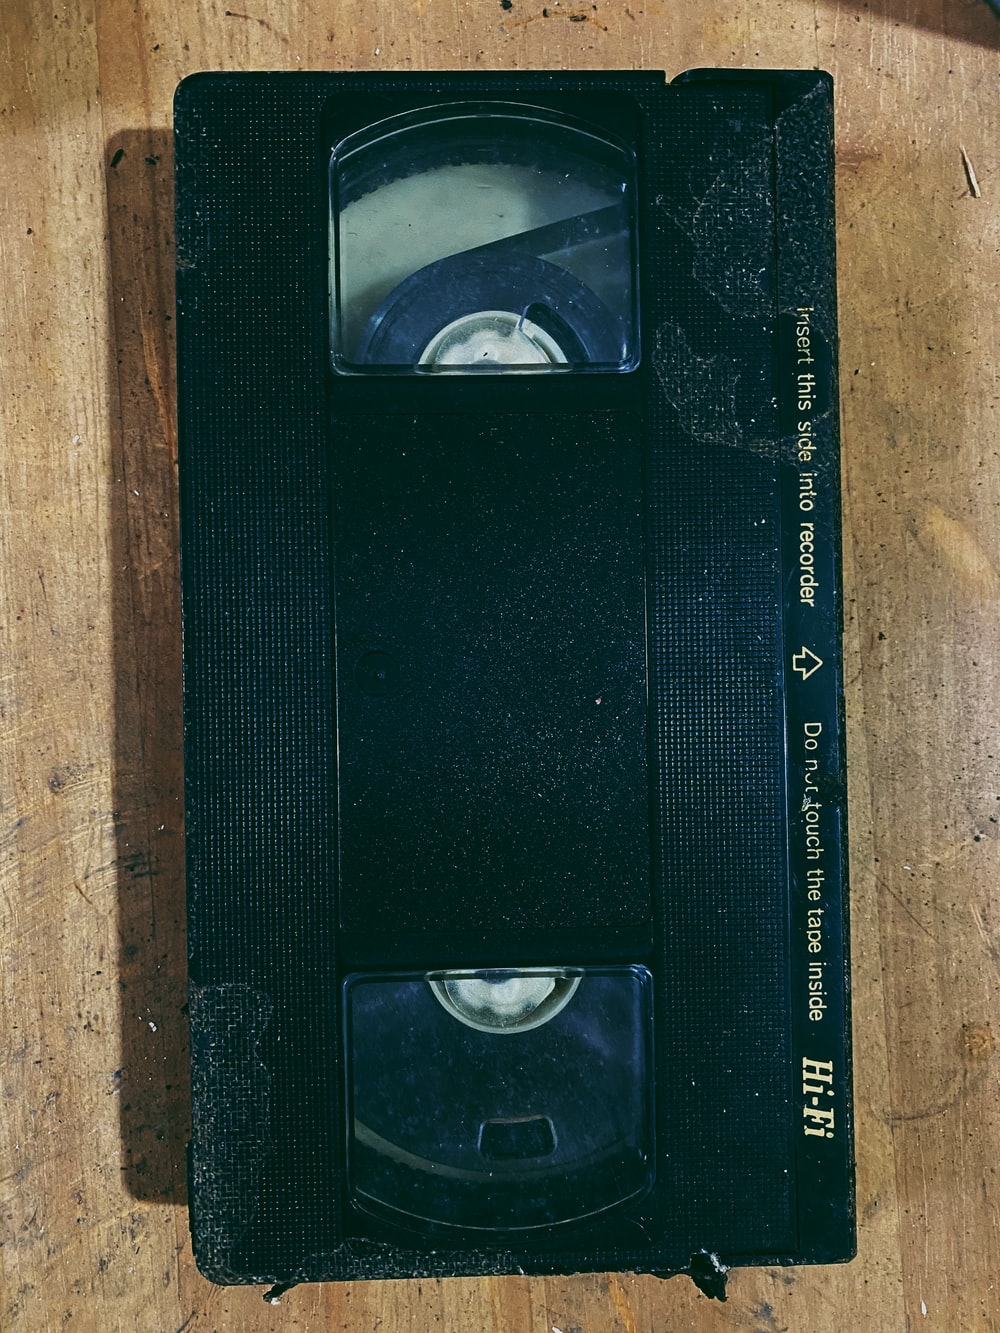 black and white rectangular device